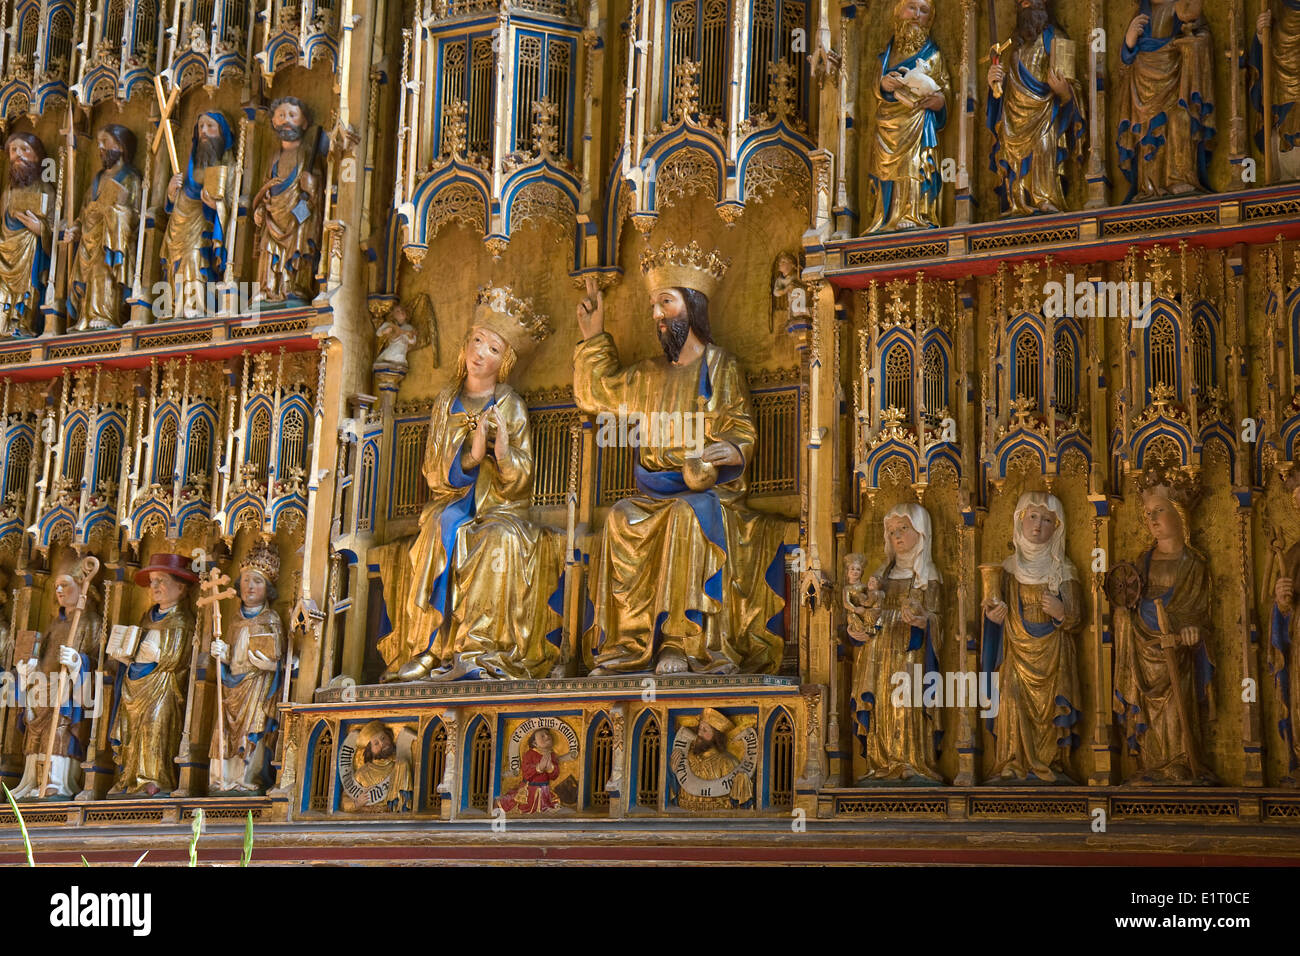 L'Europa, Germania, Meclemburgo-Pomerania, Wismar, la chiesa di San Nicola,interieur Foto Stock